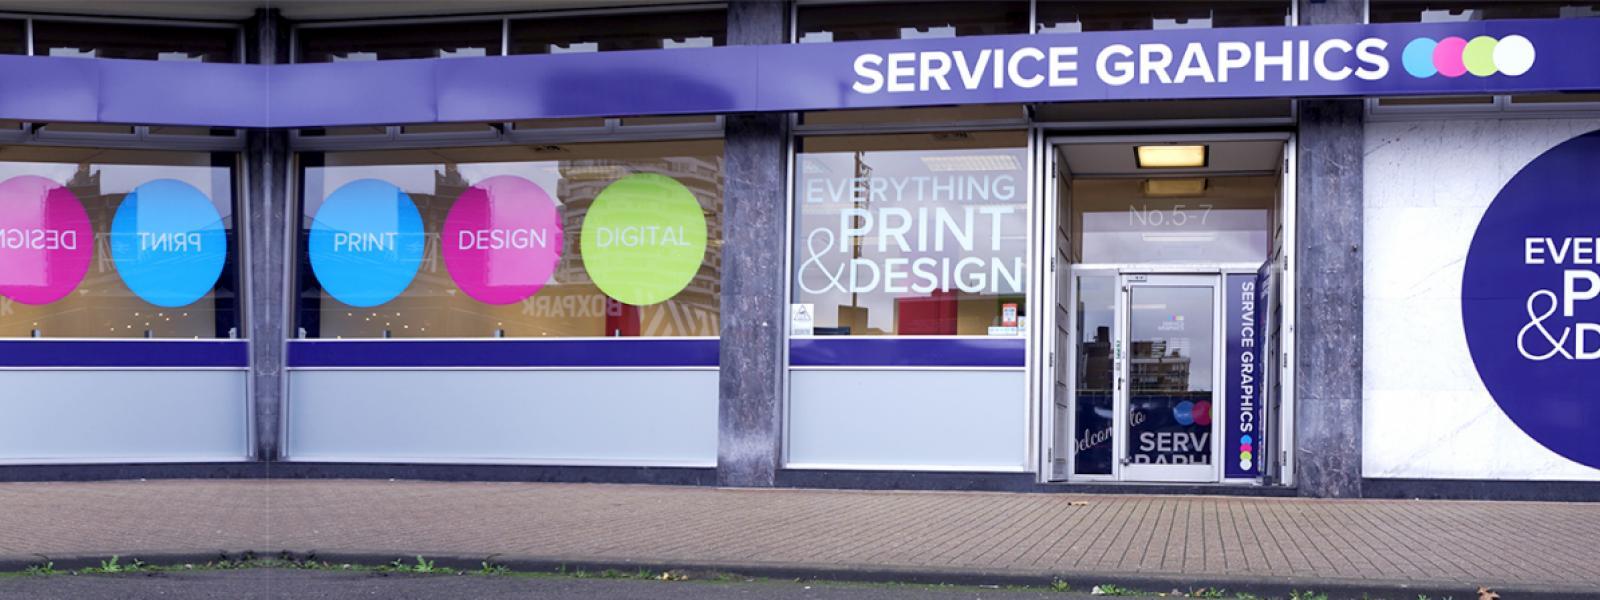 service_graphics_croydon